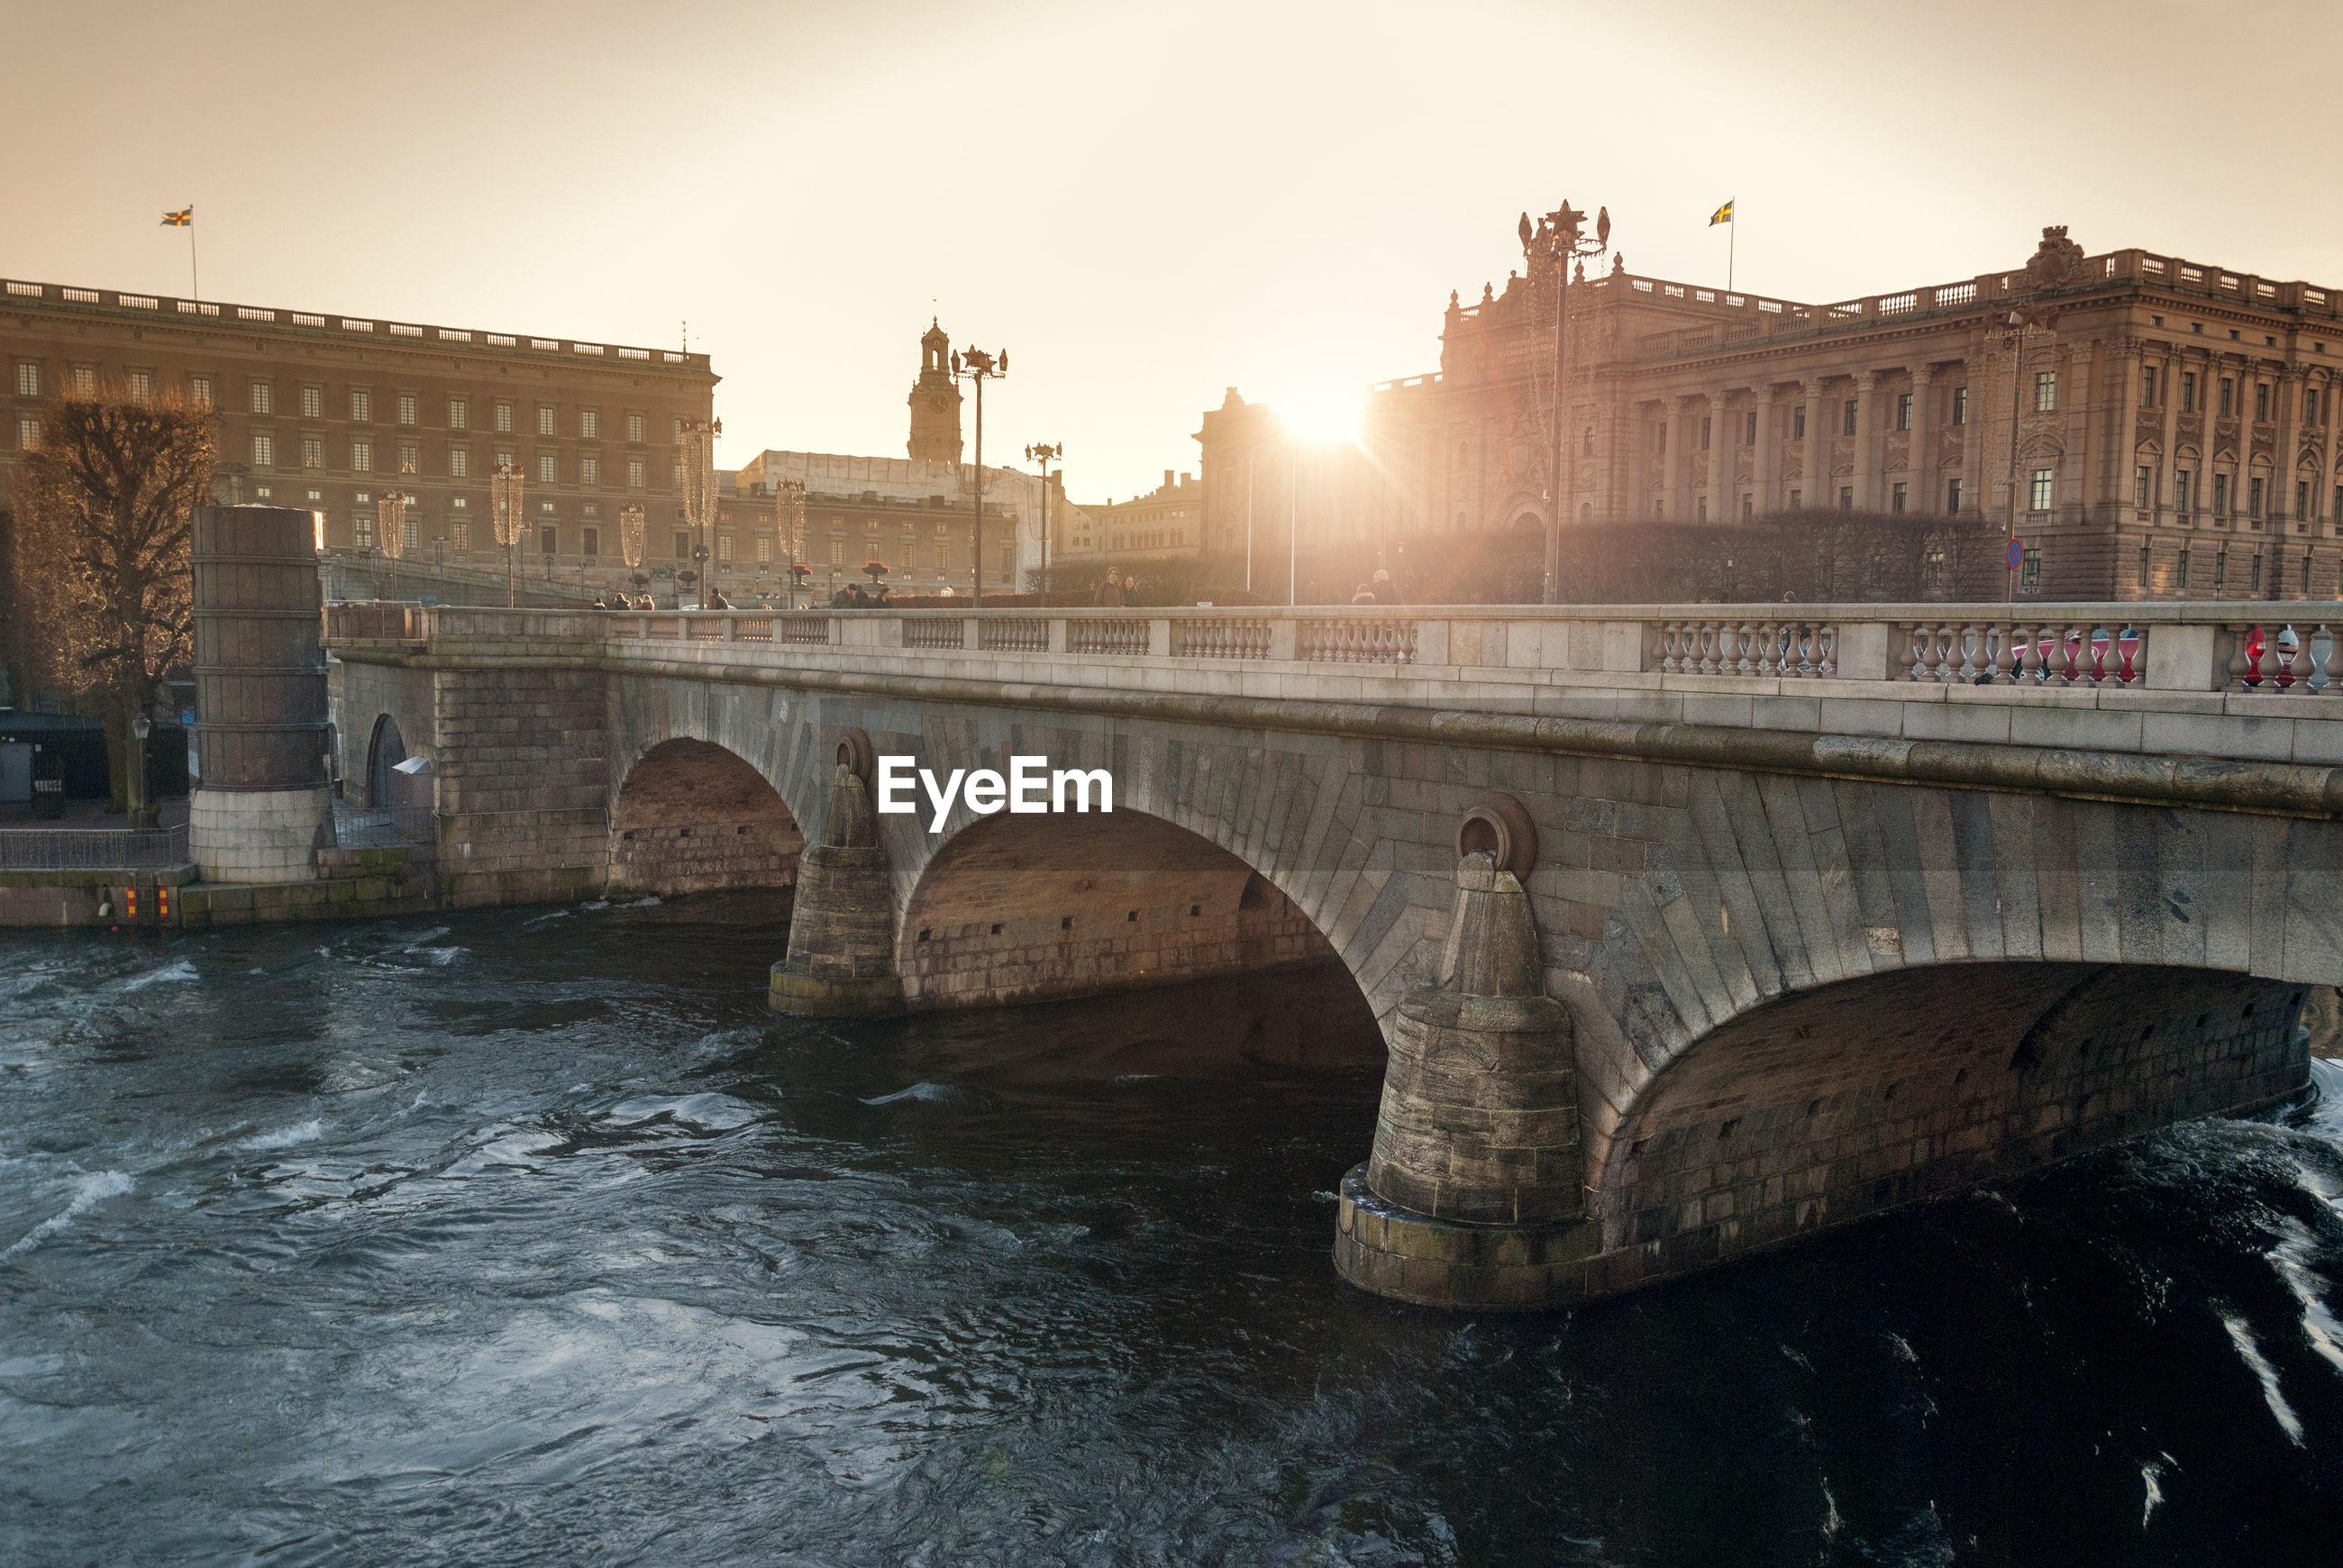 Arch bridge by historic buildings against sky